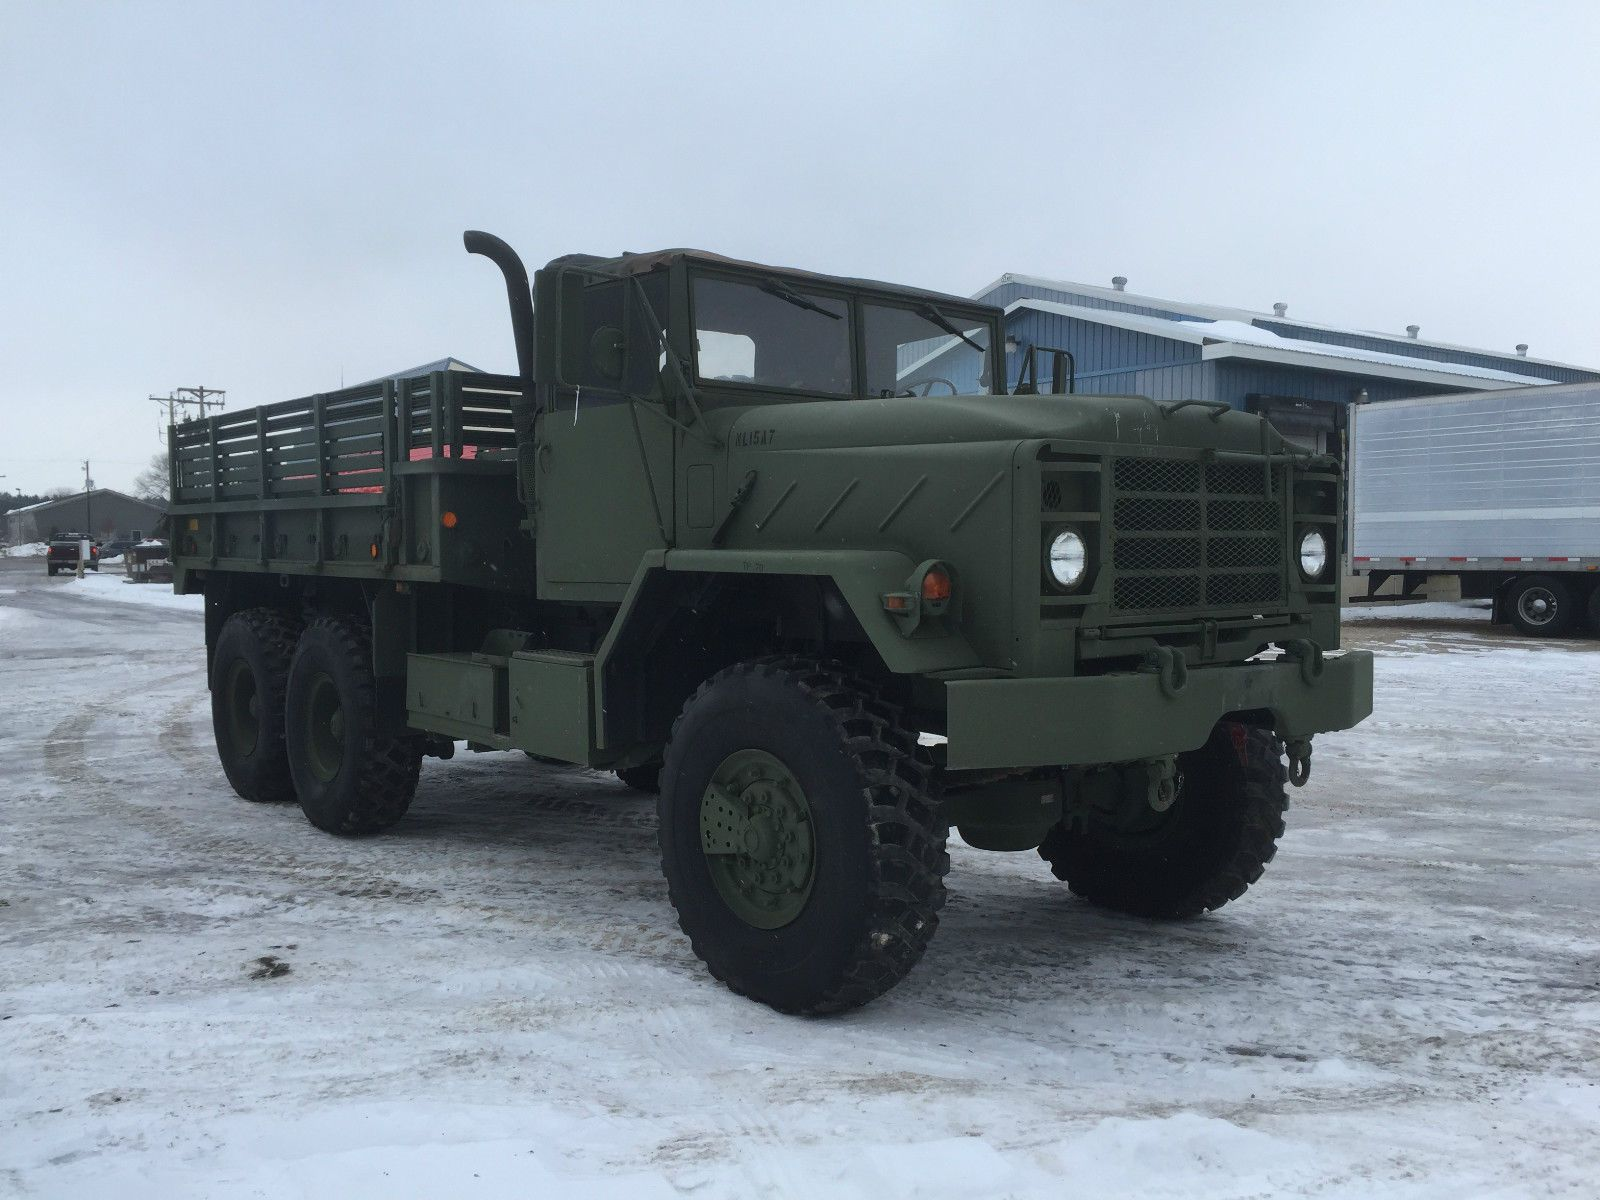 Bmy harsco military 5 ton cargo truck for sale